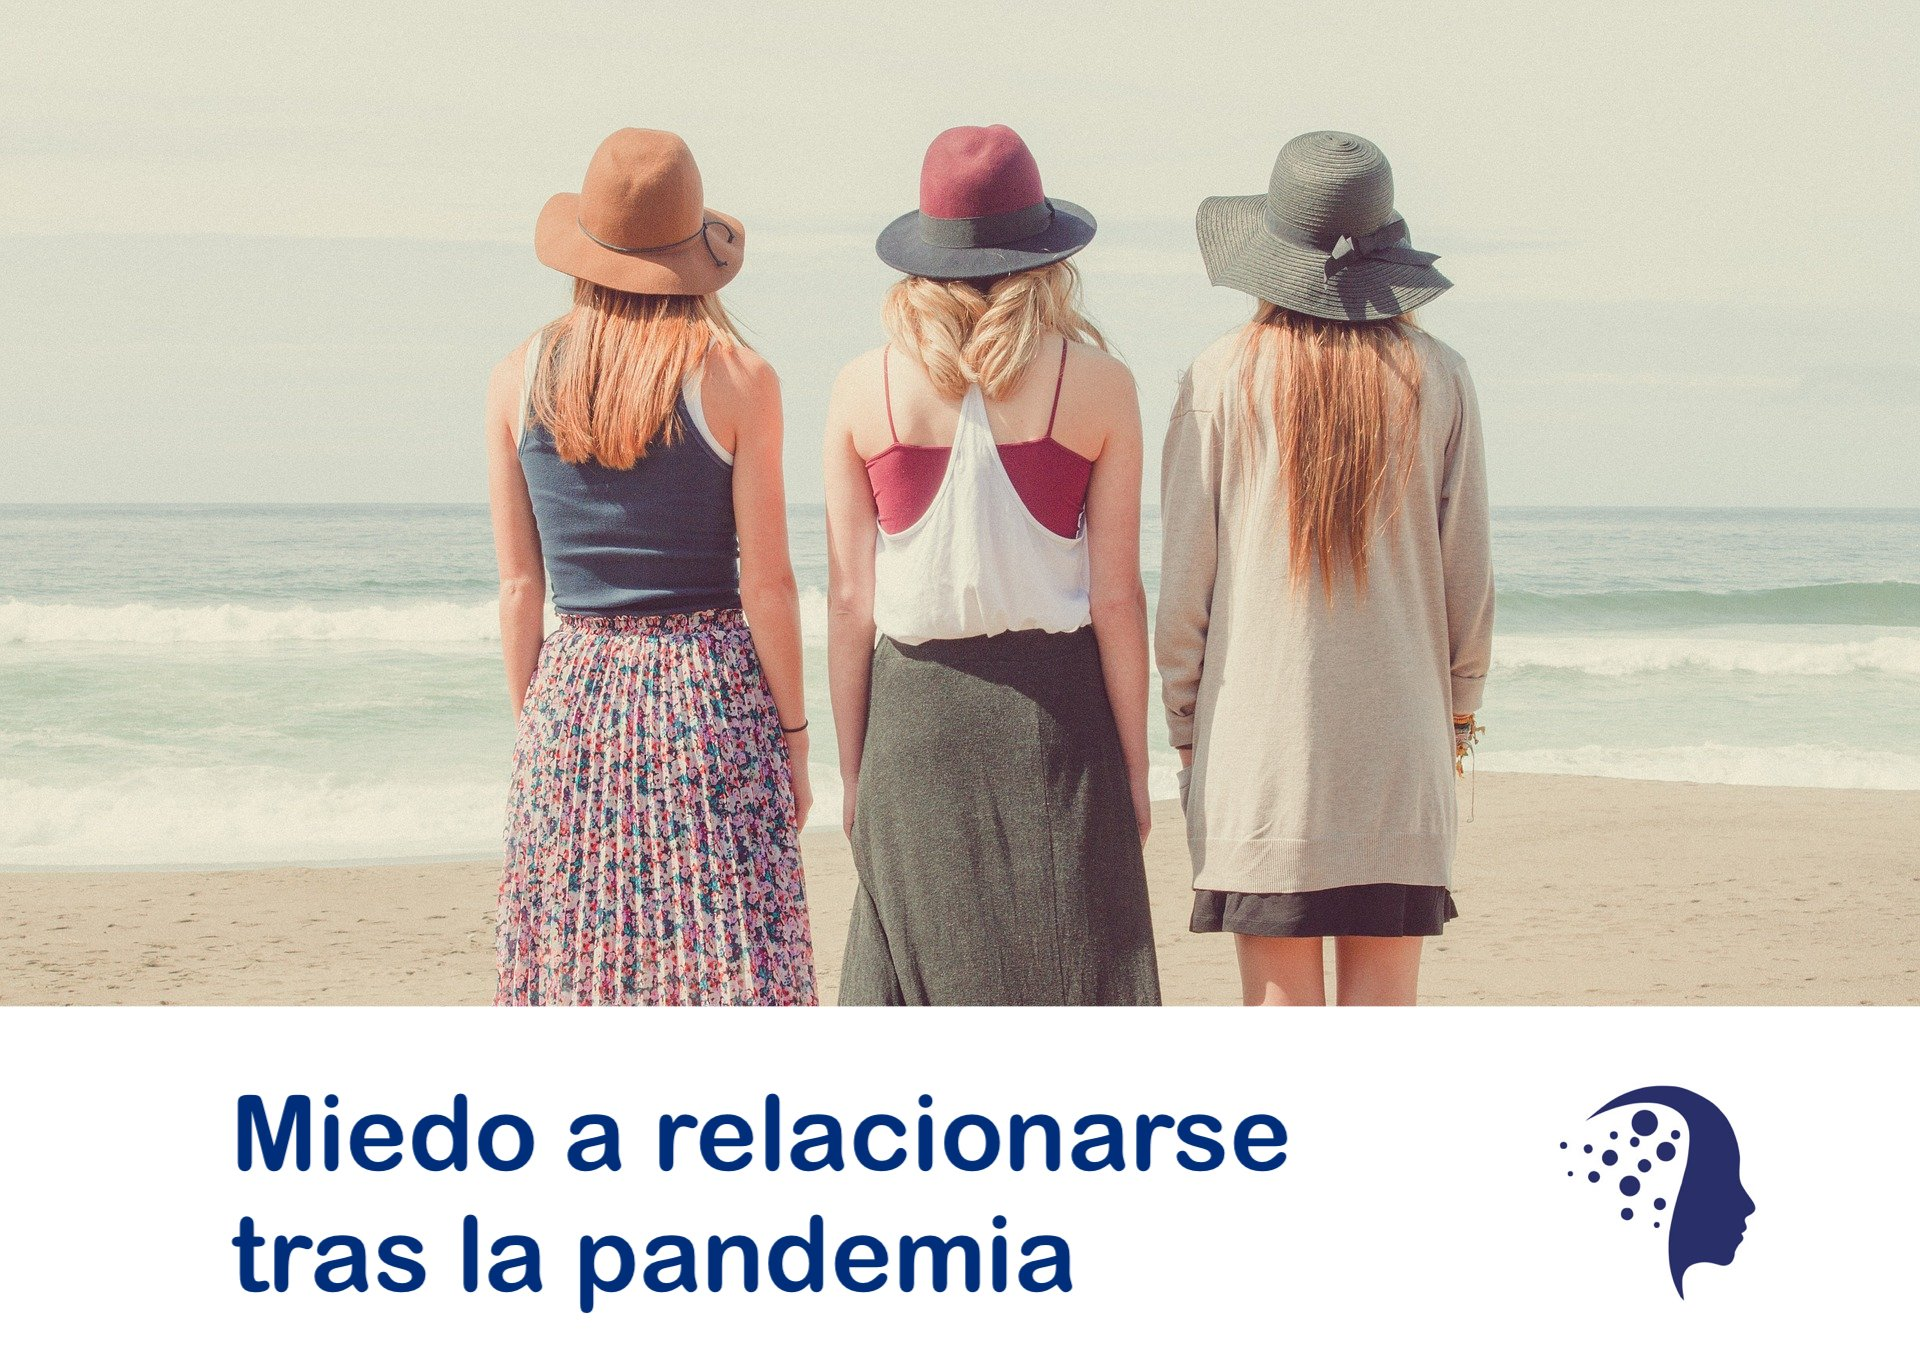 miedo-relacionarse-fobia-social-pandemia-sara-navarrete-psicologa-valencia - Psicólogo en Valencia